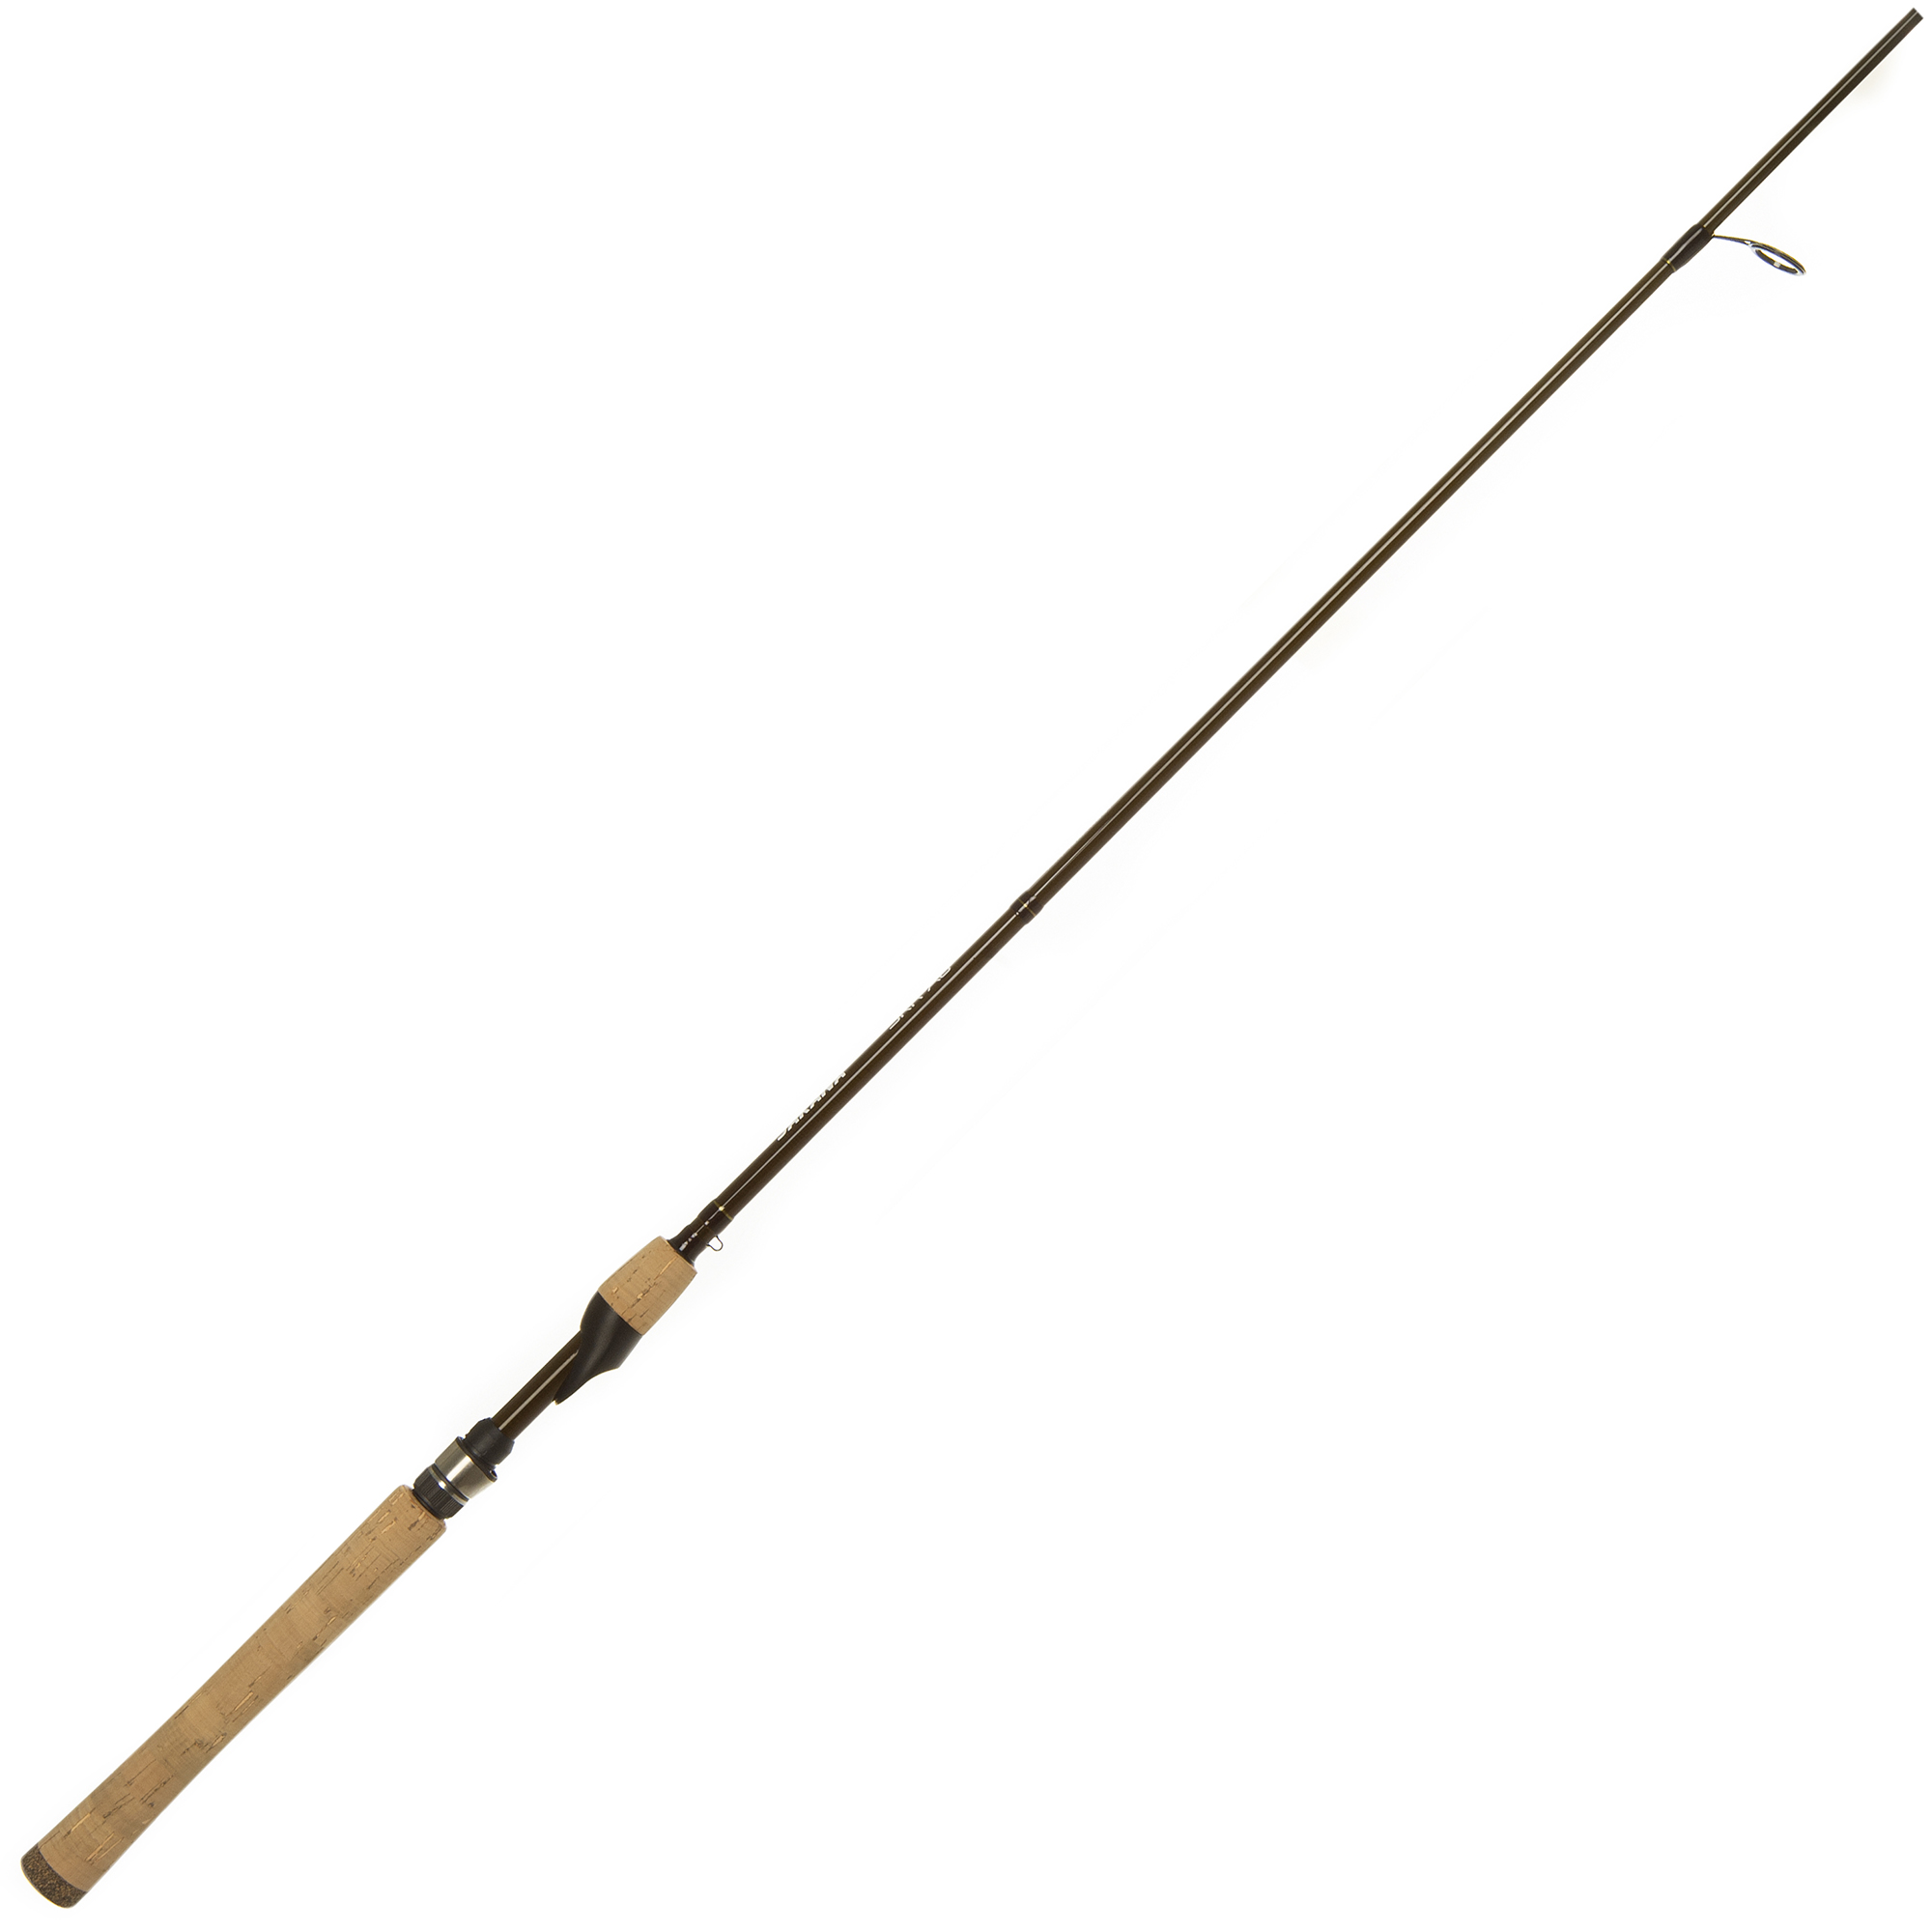 Sakana SKR-A6 Panfish/Trout Spinning Rod thumbnail